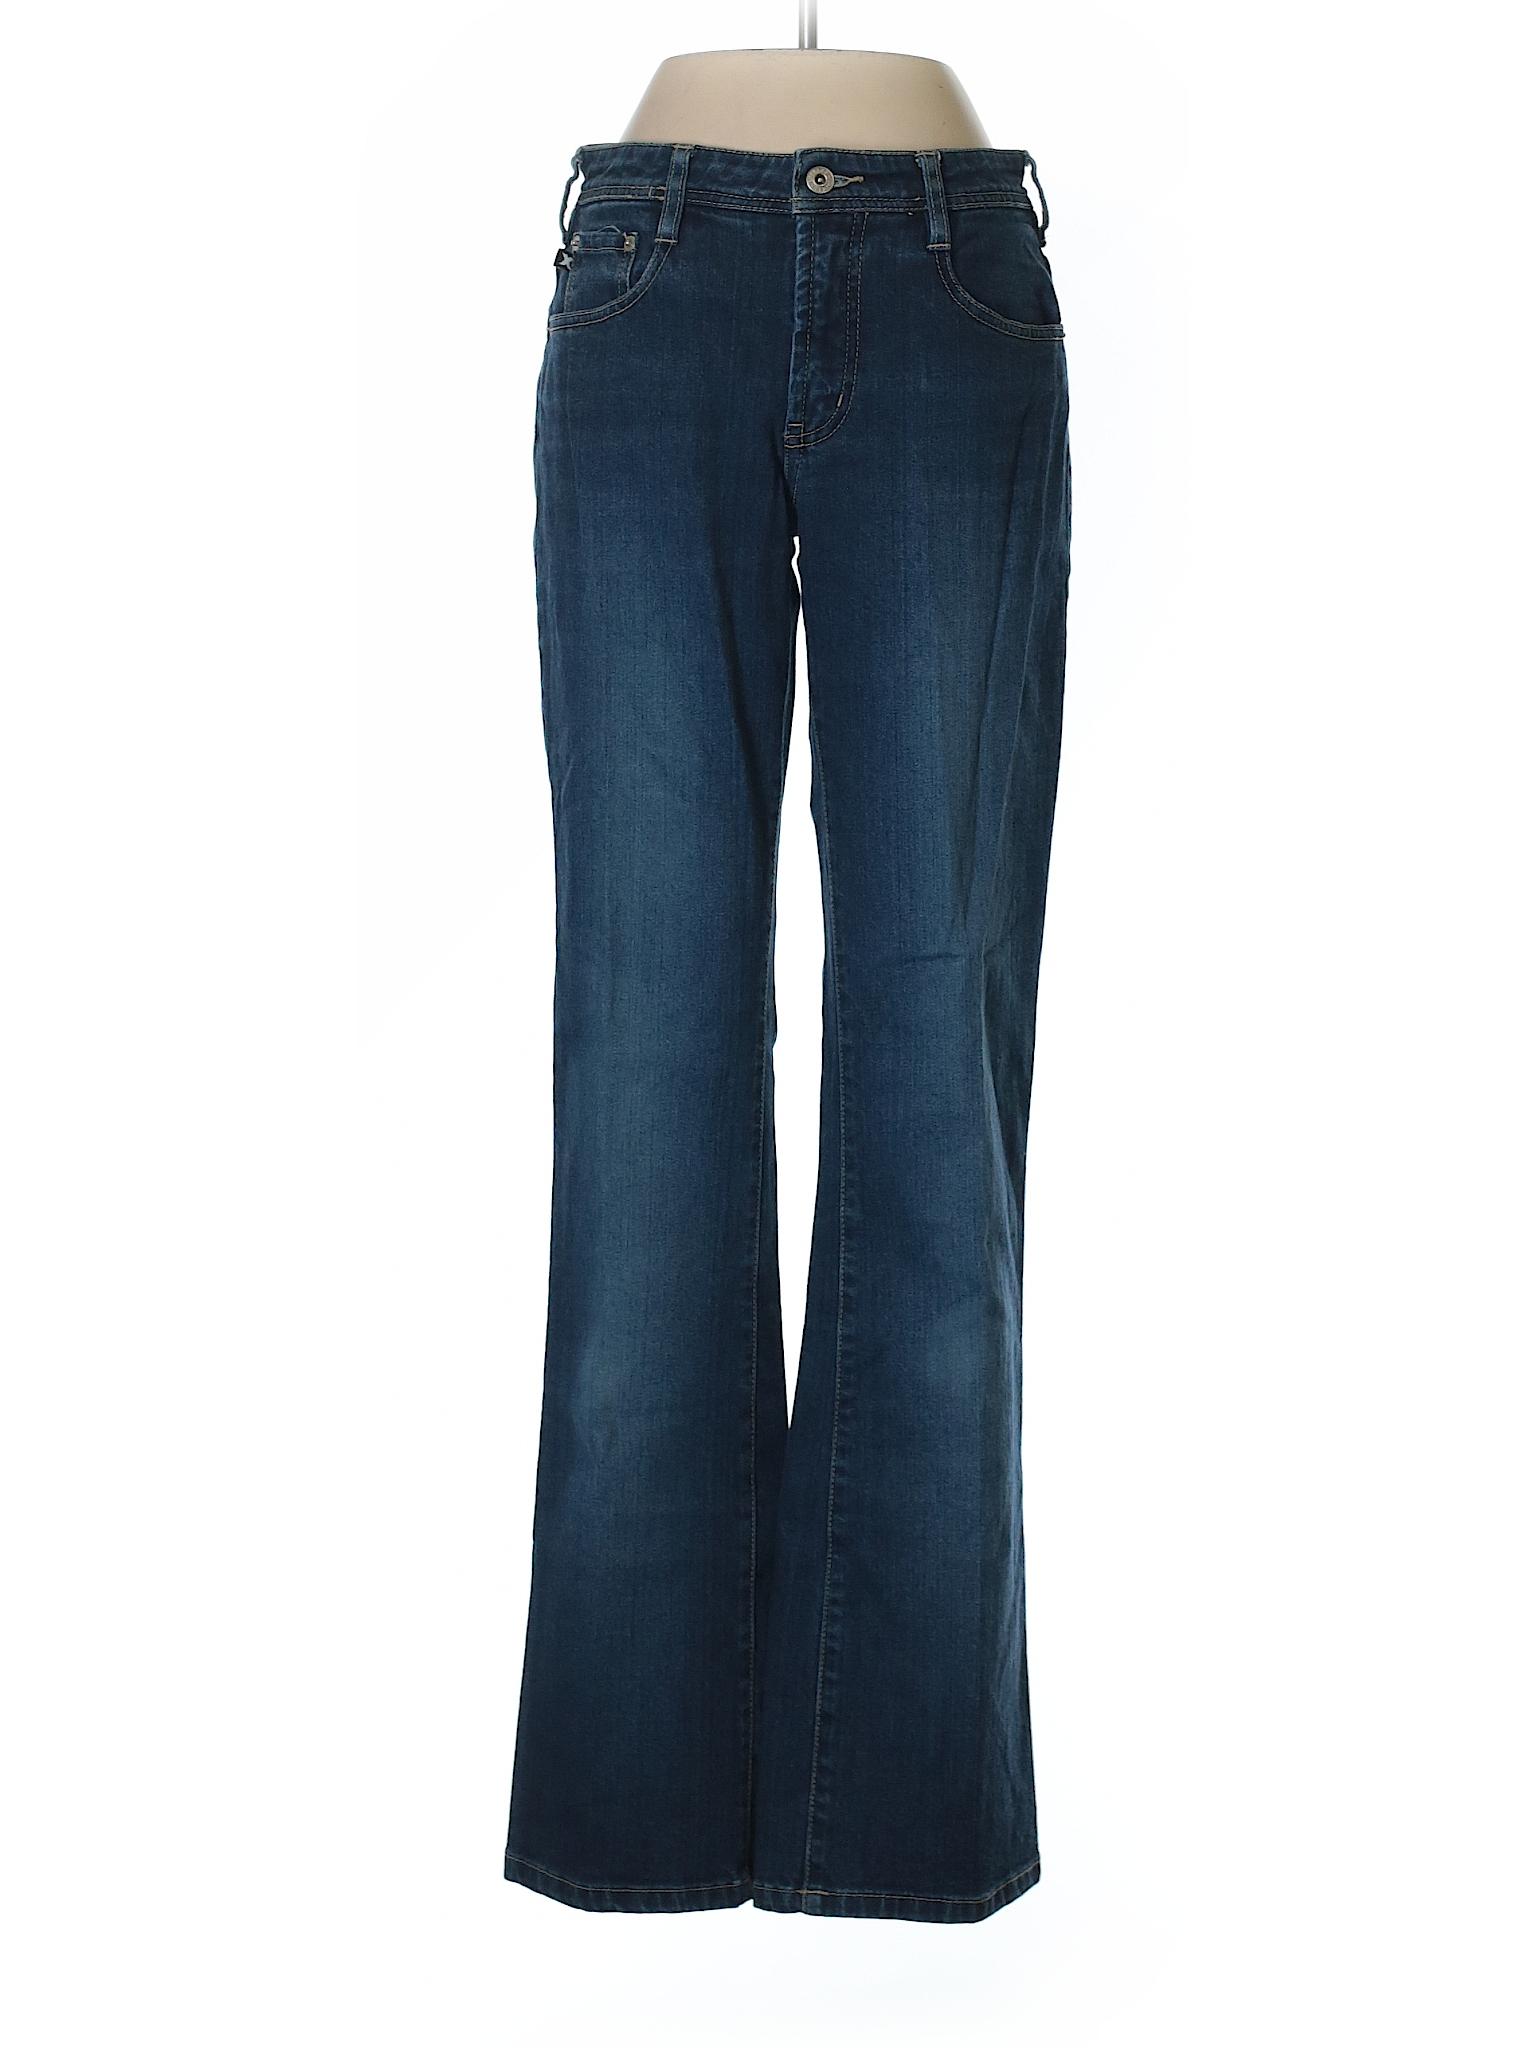 Jeans Promotion Express Jeans Promotion Express Express Promotion UqYPq4